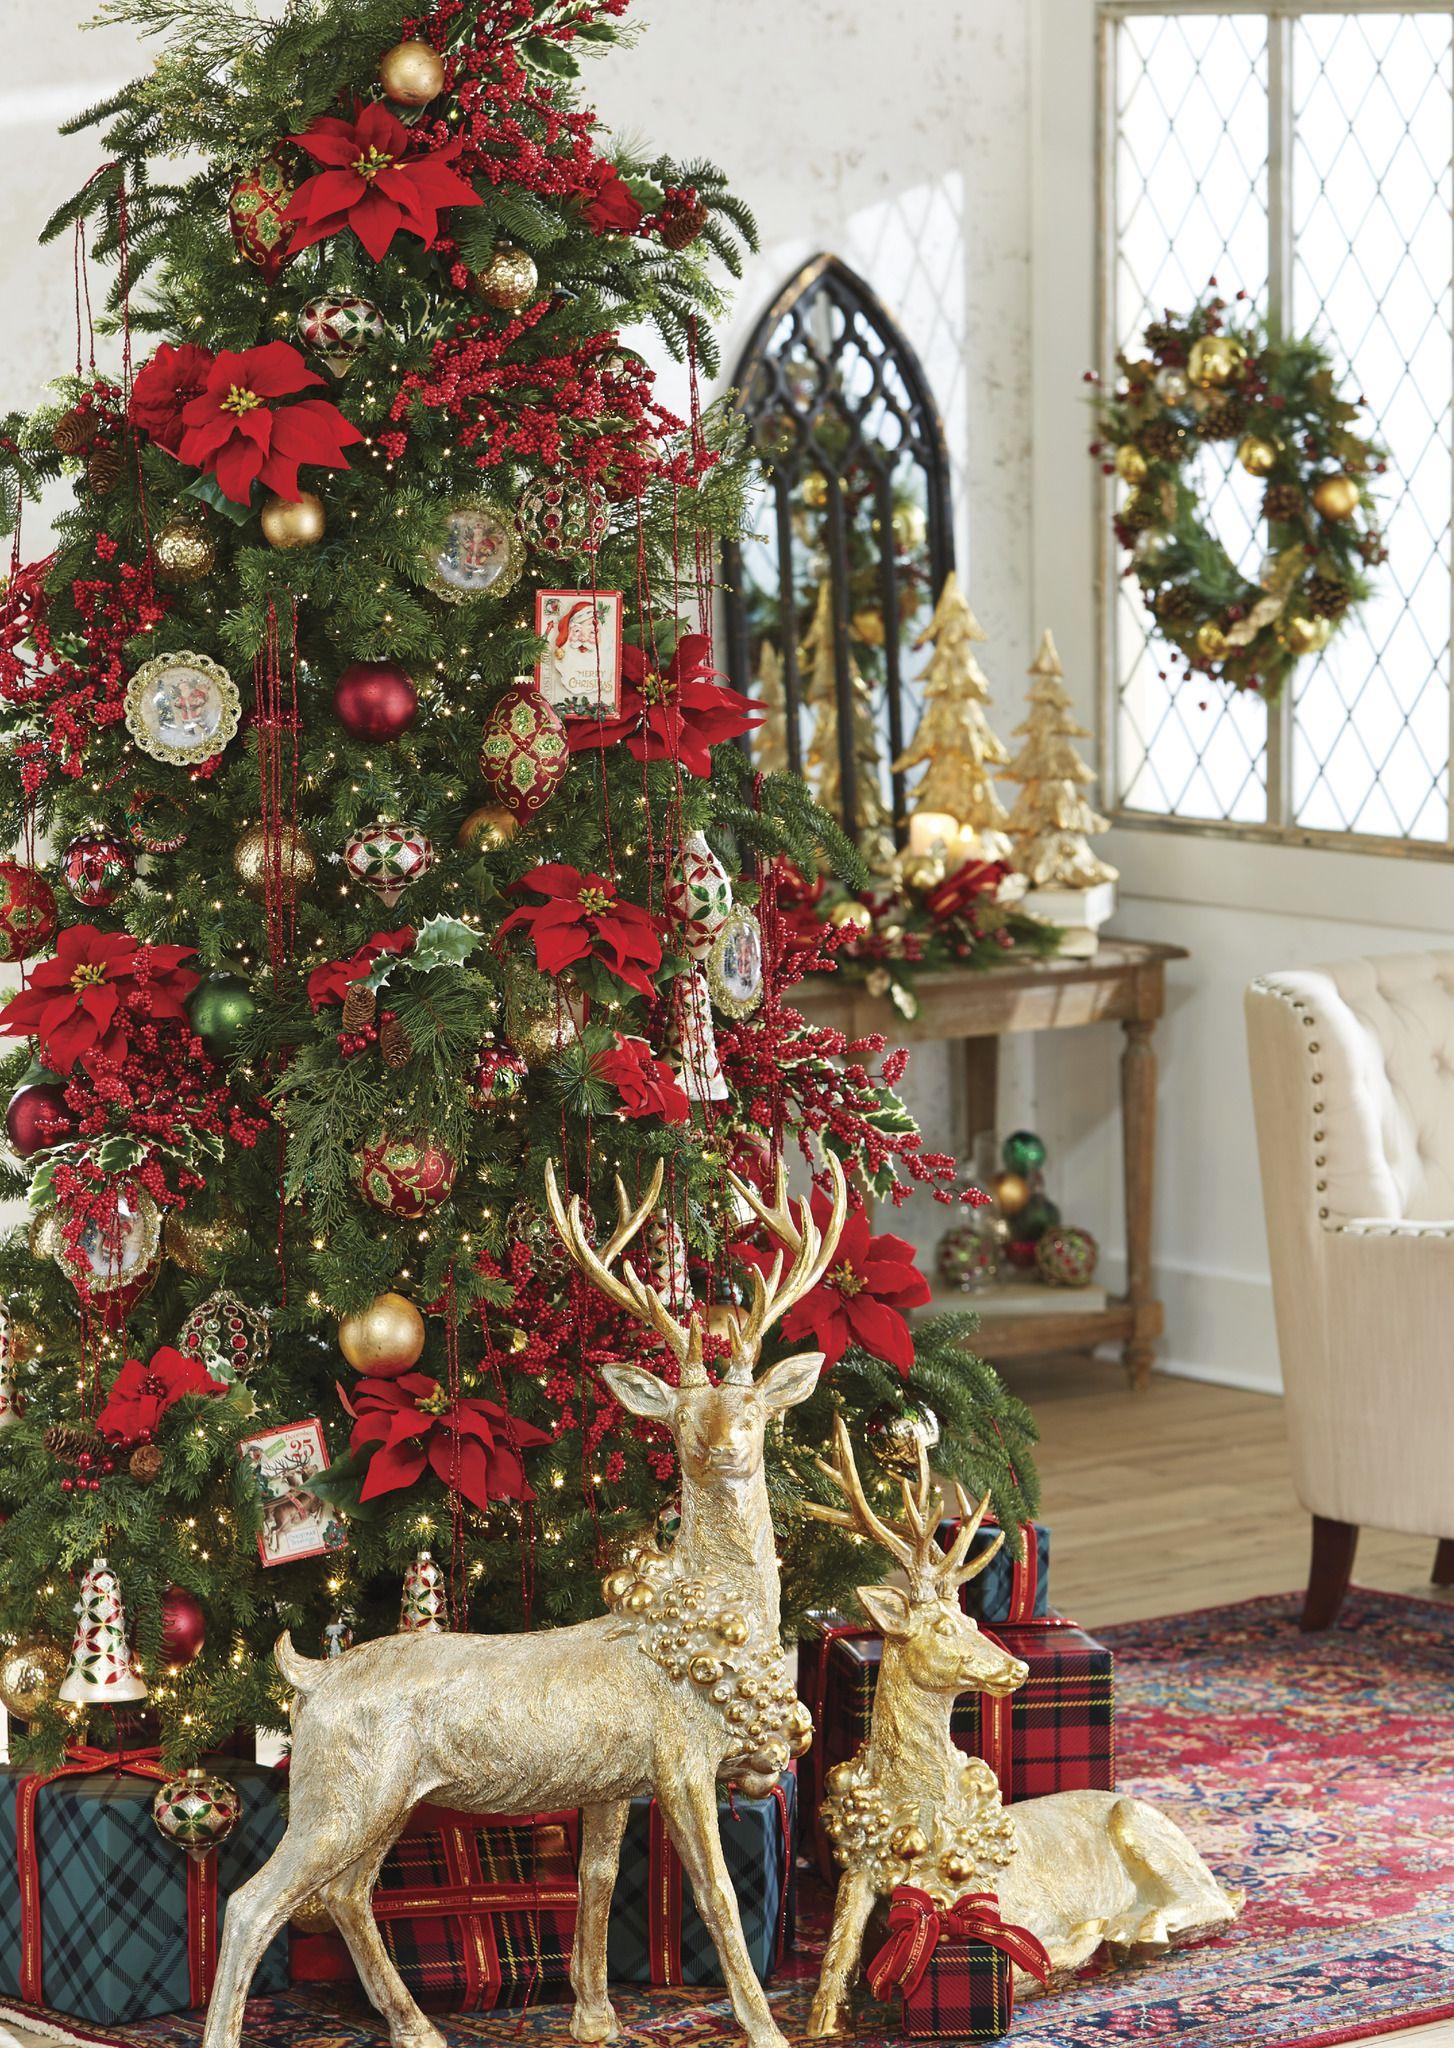 2019 Raz Christmas Tree Inspiration Trendy Tree Blog Holiday Decor Inspiration Wrea Amazing Christmas Trees Christmas Tree Inspiration Gold Christmas Tree